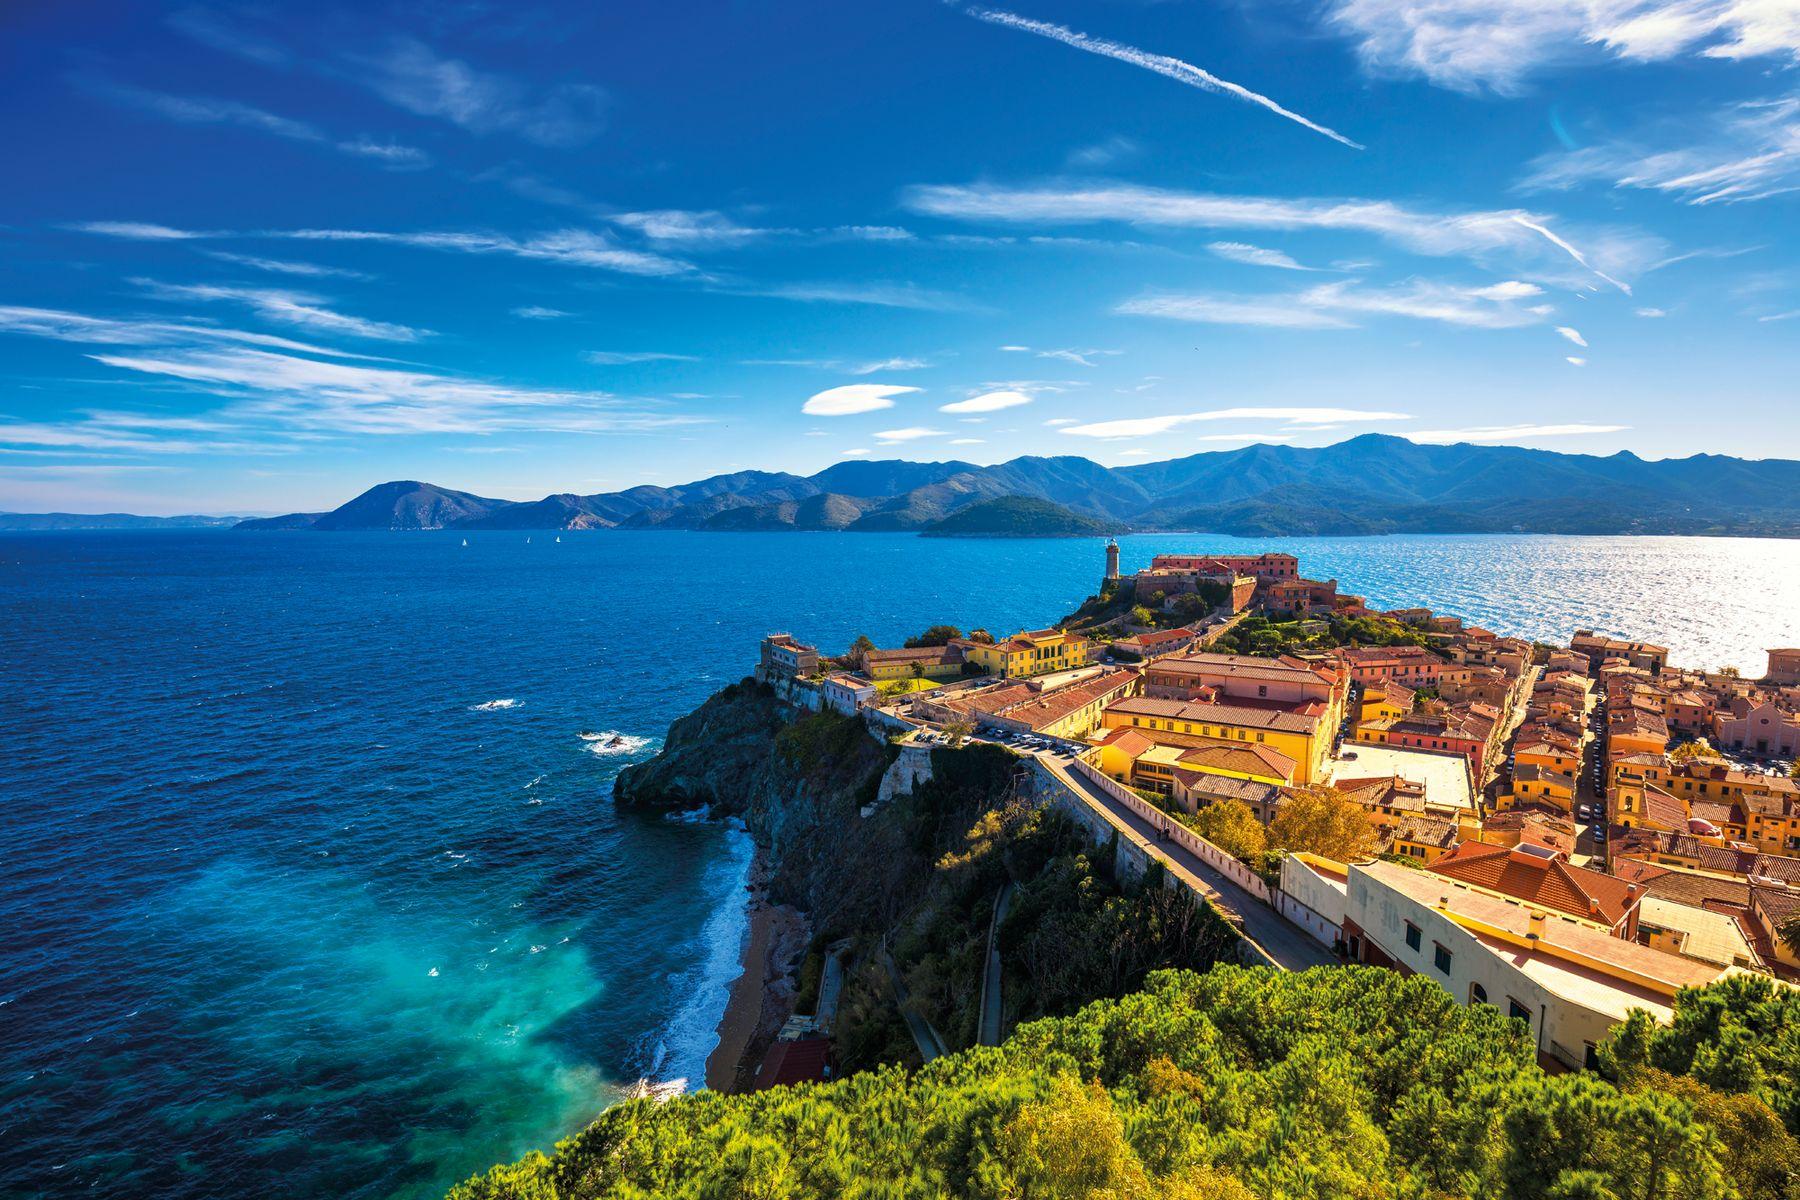 Elba island Portoferraio aerial view. Lighthouse and fort. Tusc 502162530 8642x5761